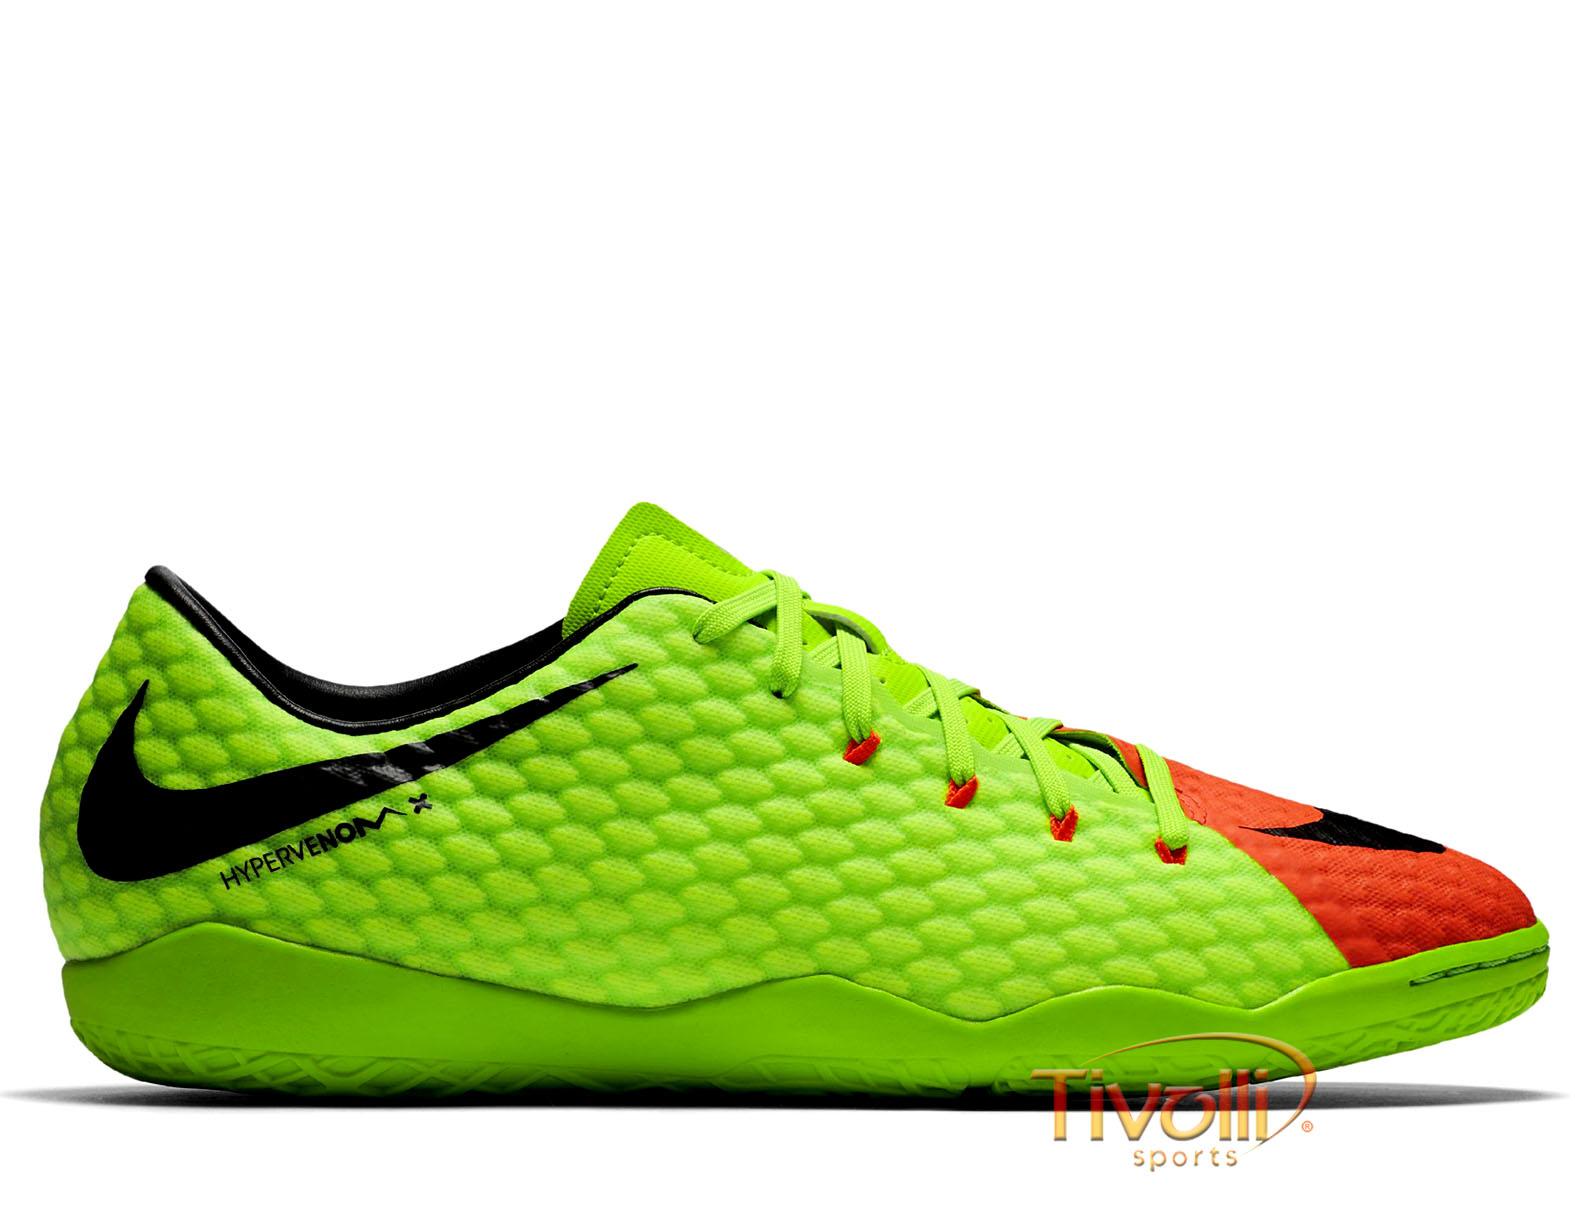 b966707dd15d5 Chuteira Nike HypervenomX Phelon III IC Futsal > >